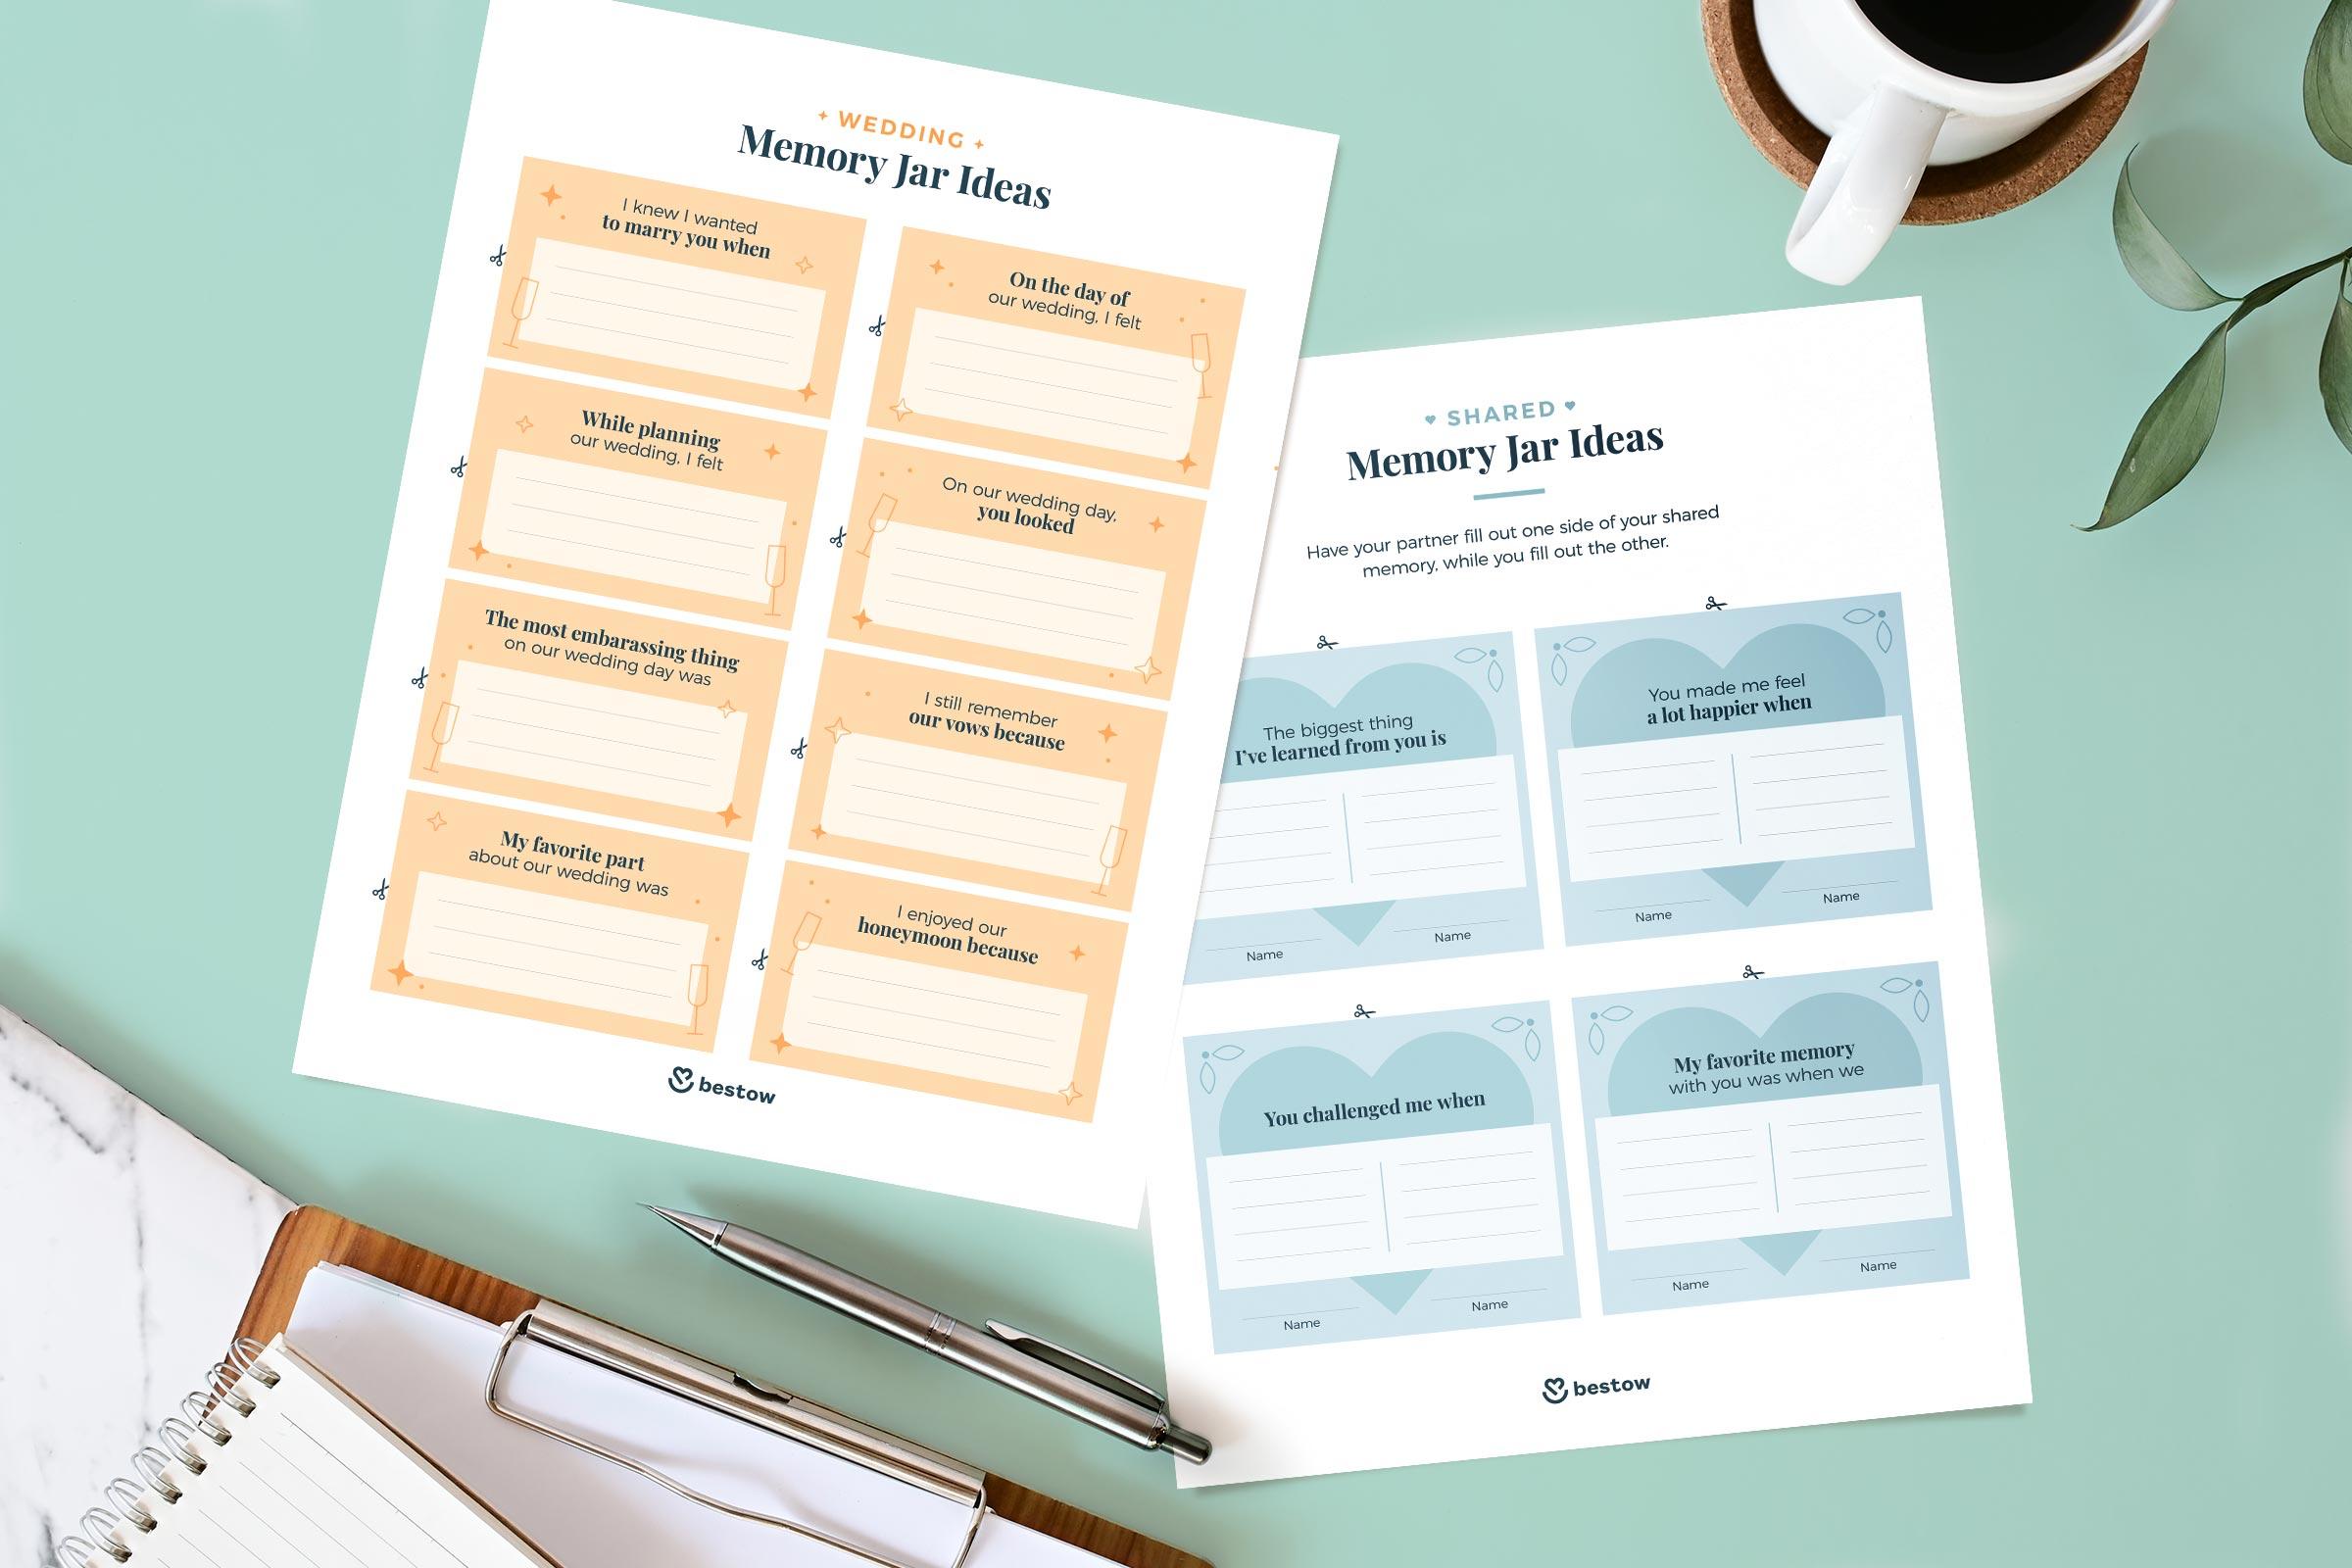 newlywed-mockup-memory-jar-ideas